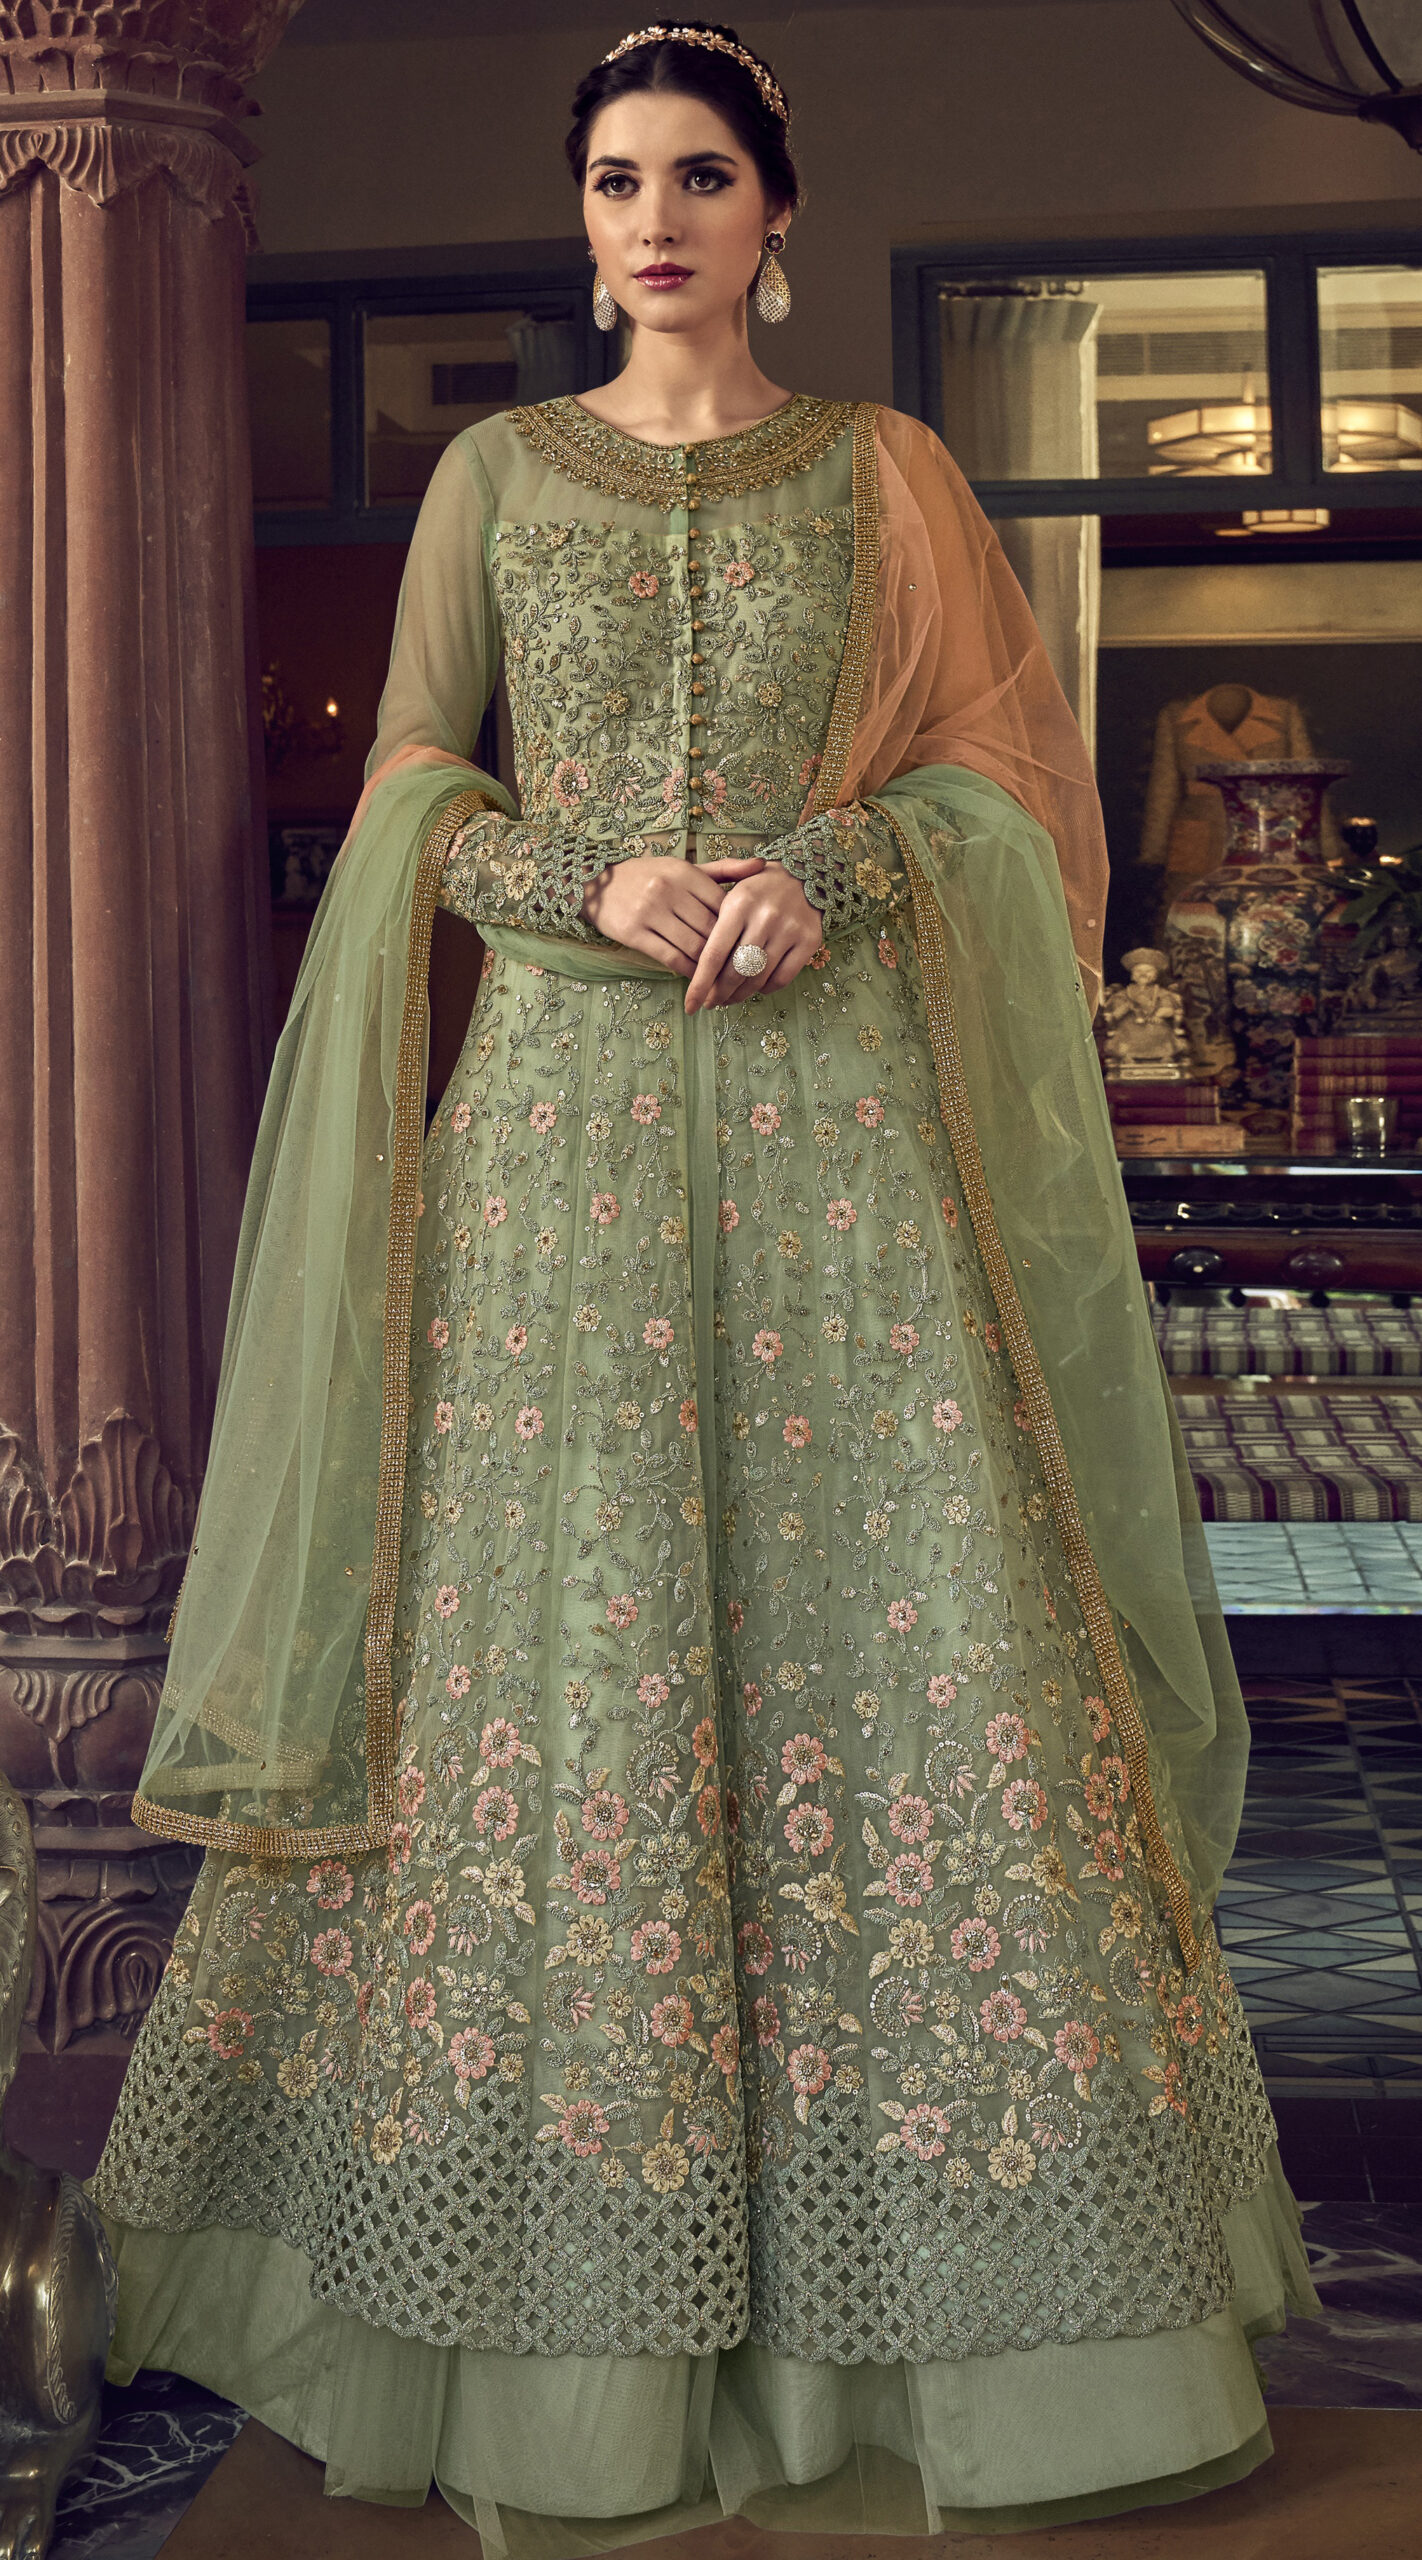 Kundali Bhagya Preea Dress Image in Doubble Layered Gown n Net